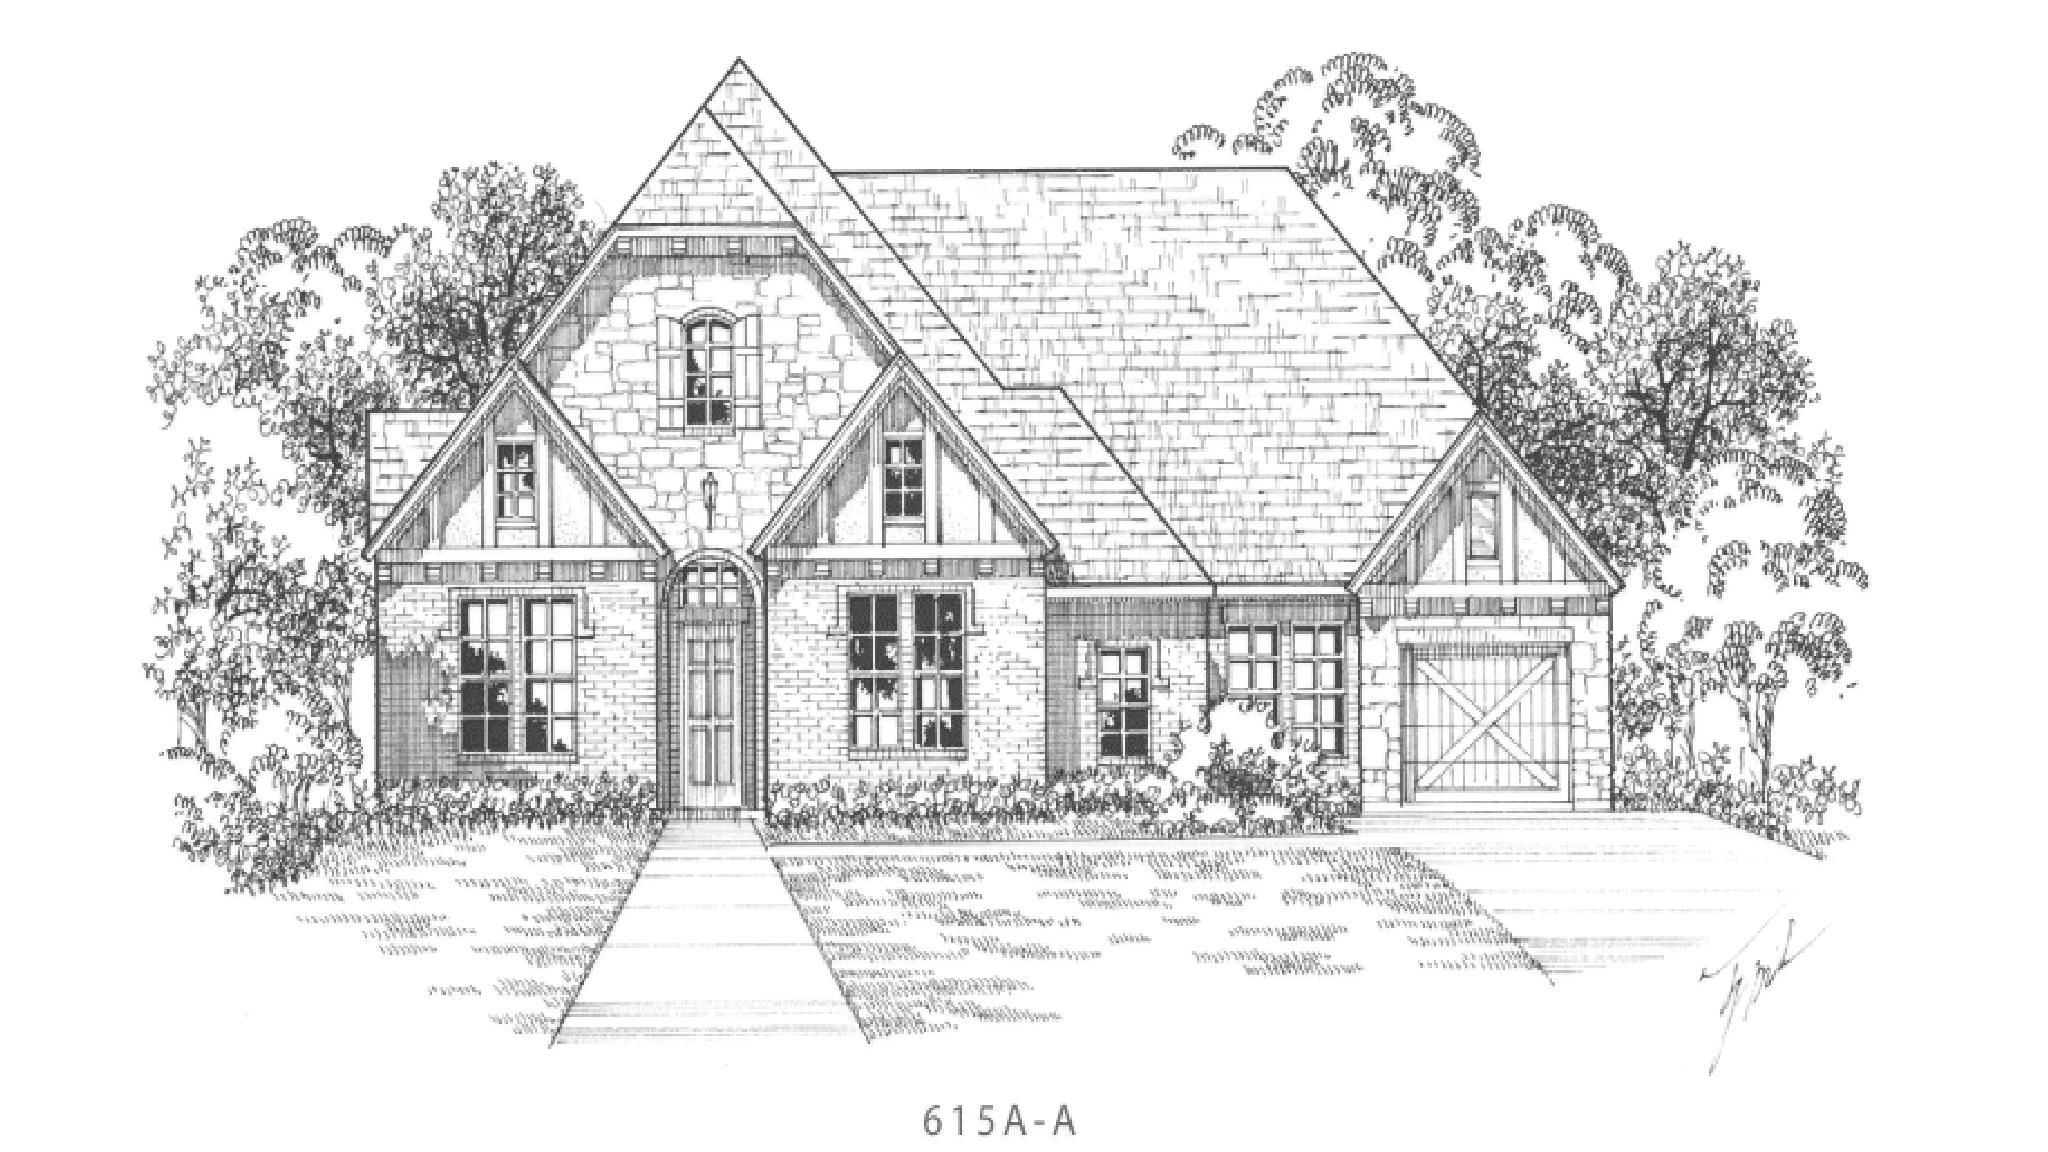 Single Family for Sale at Wichita Estates - 615a 205 Chisholm Trail Highland Village, Texas 75077 United States